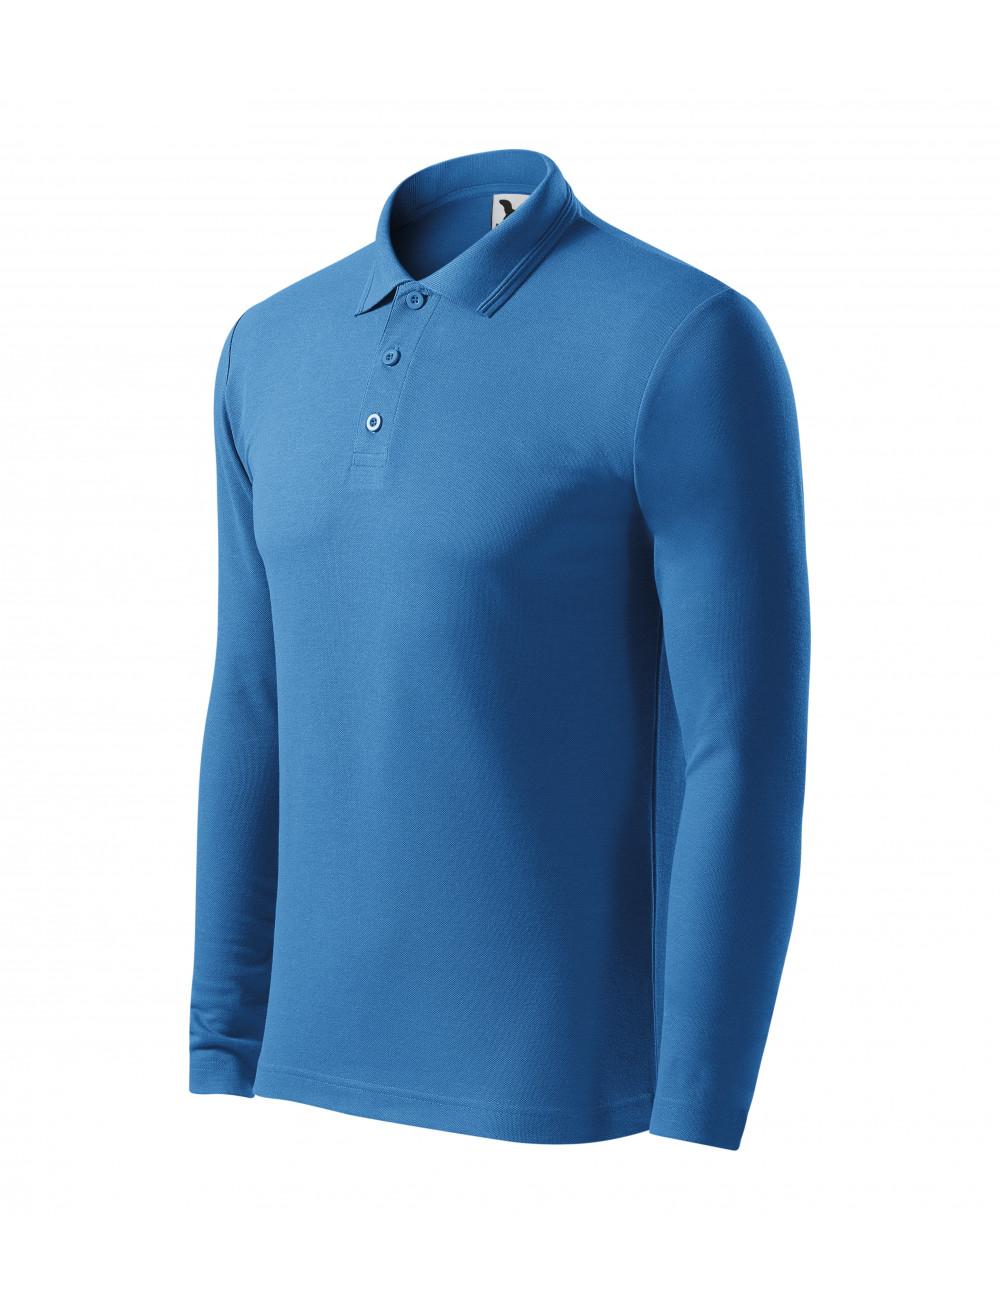 Adler MALFINI Koszulka polo męska Pique Polo LS 221 lazurowy